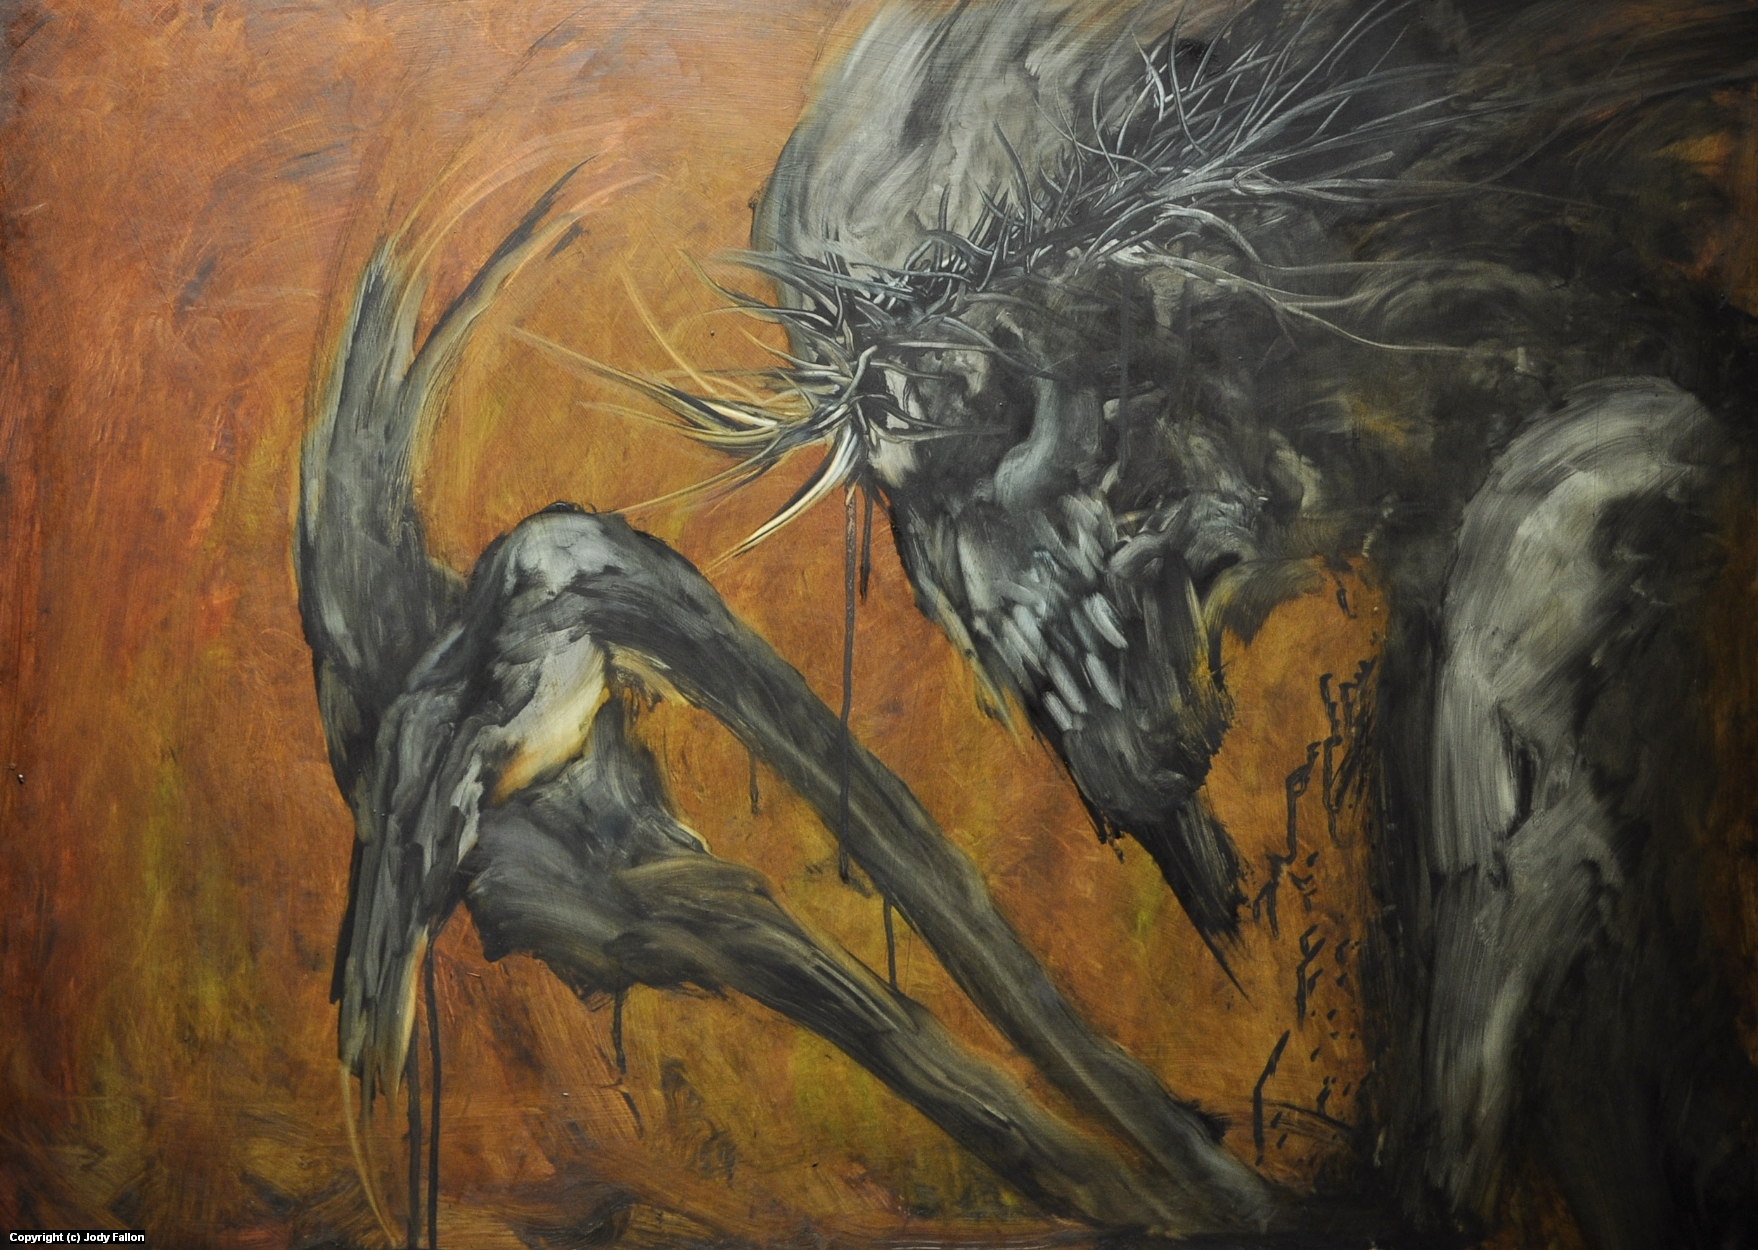 Who Will Say a Prayer Artwork by Jody Fallon